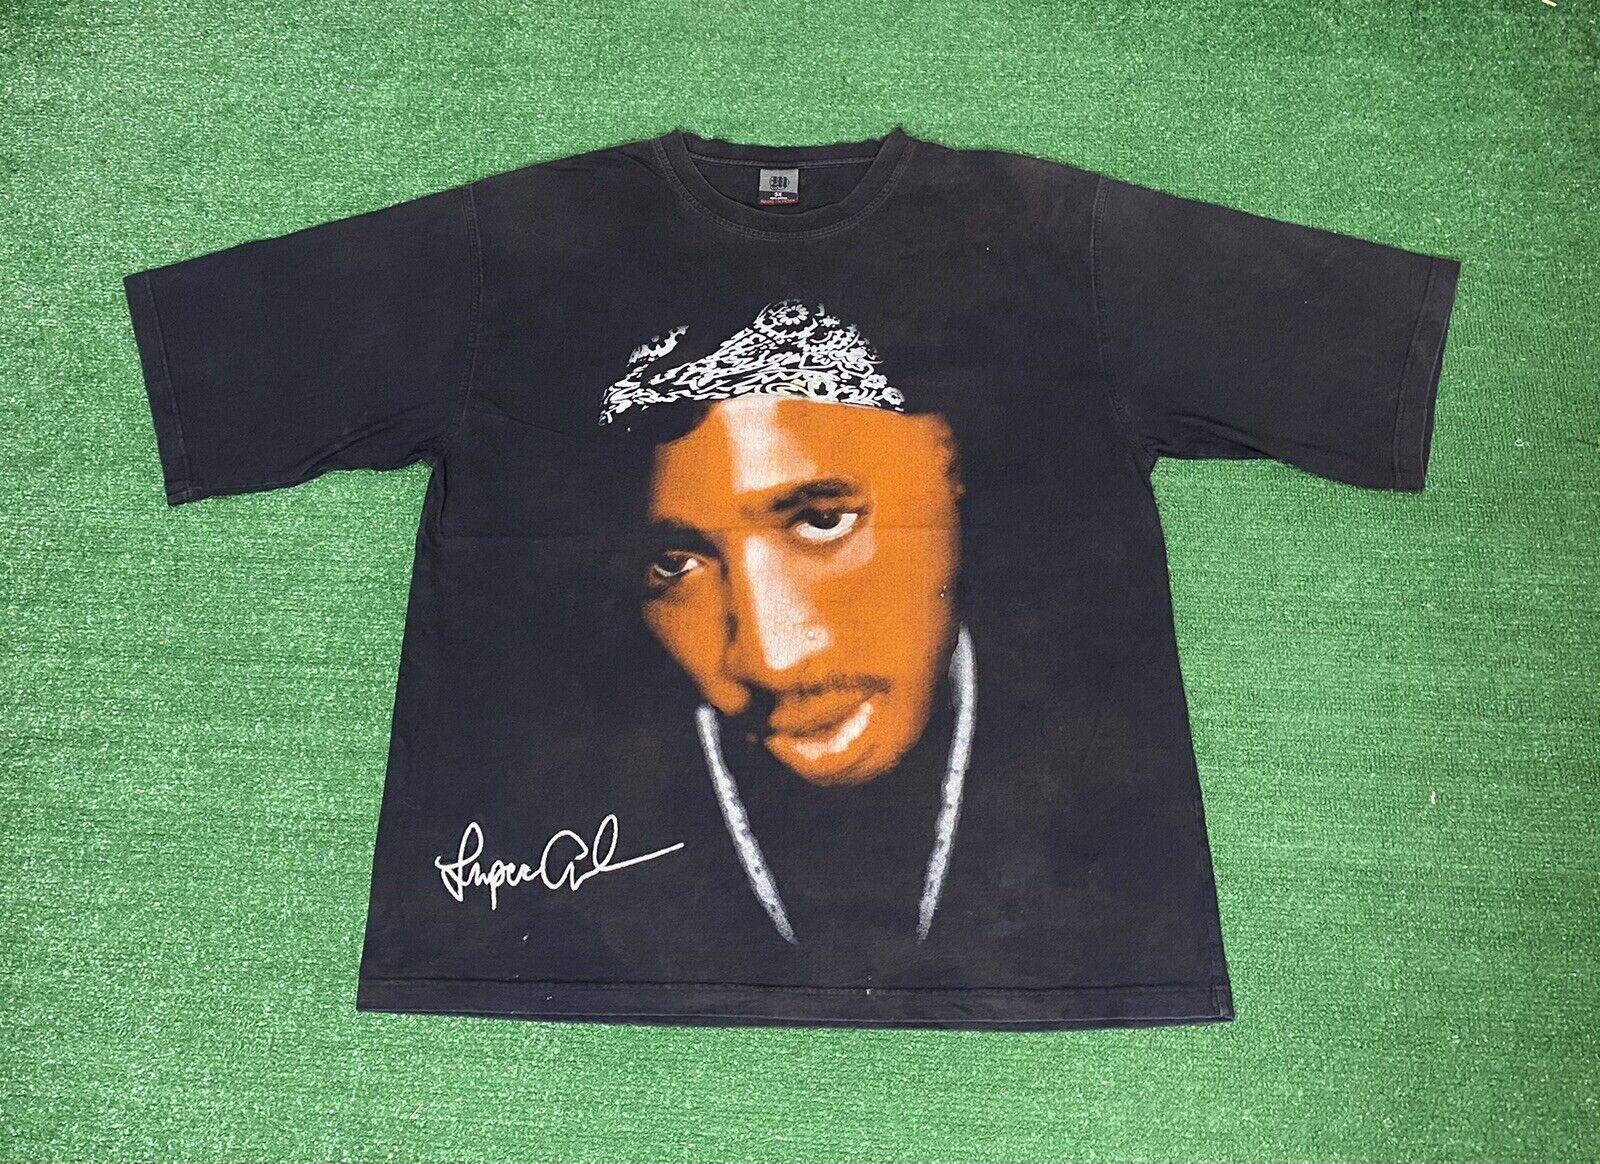 Vtg 90s 2PAC Tupac Biggie Notorious BIG Rap Hip Hop T-shirt Wanted Makaveli